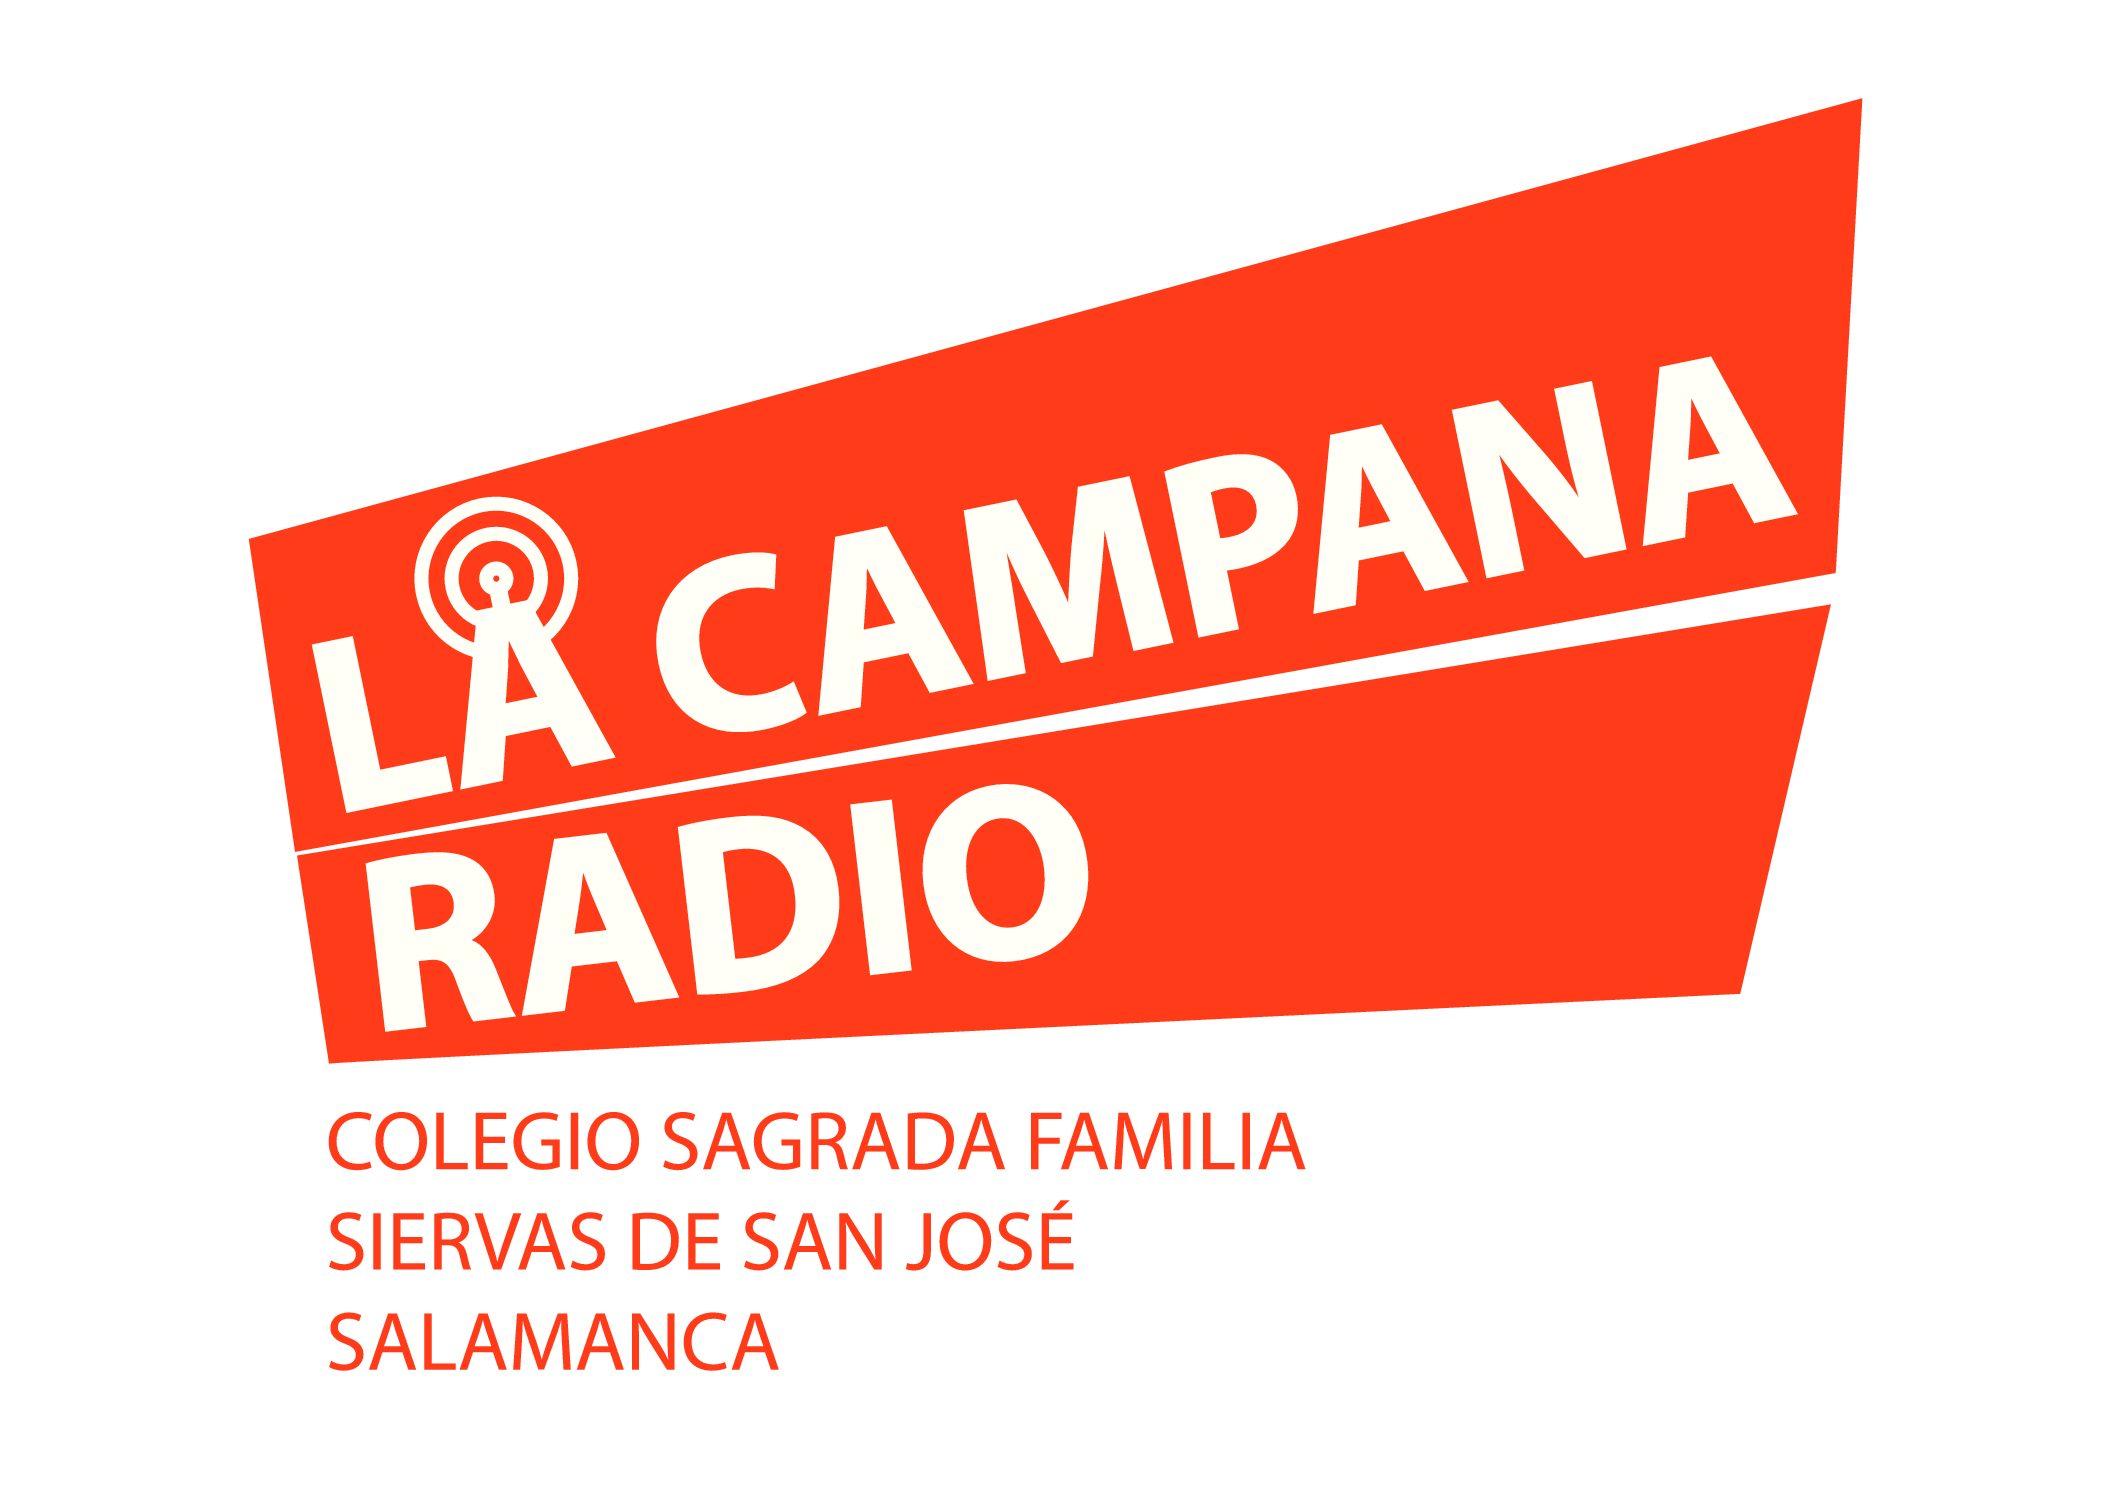 LA CAMPANA RADIO